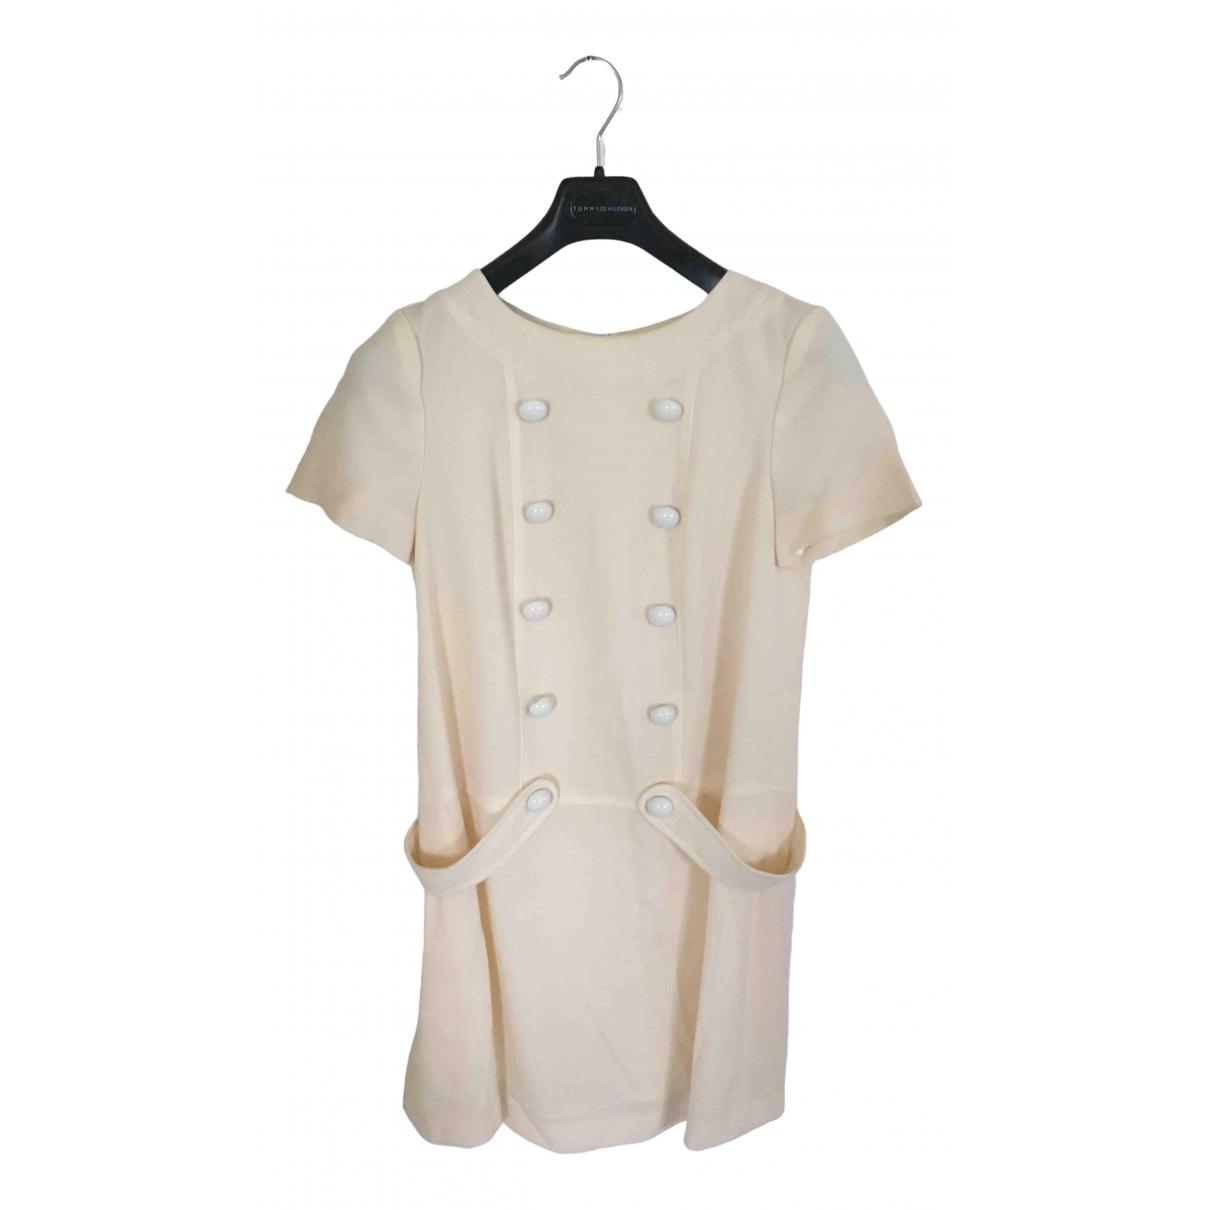 Uterque \N Kleid in  Ecru Polyester